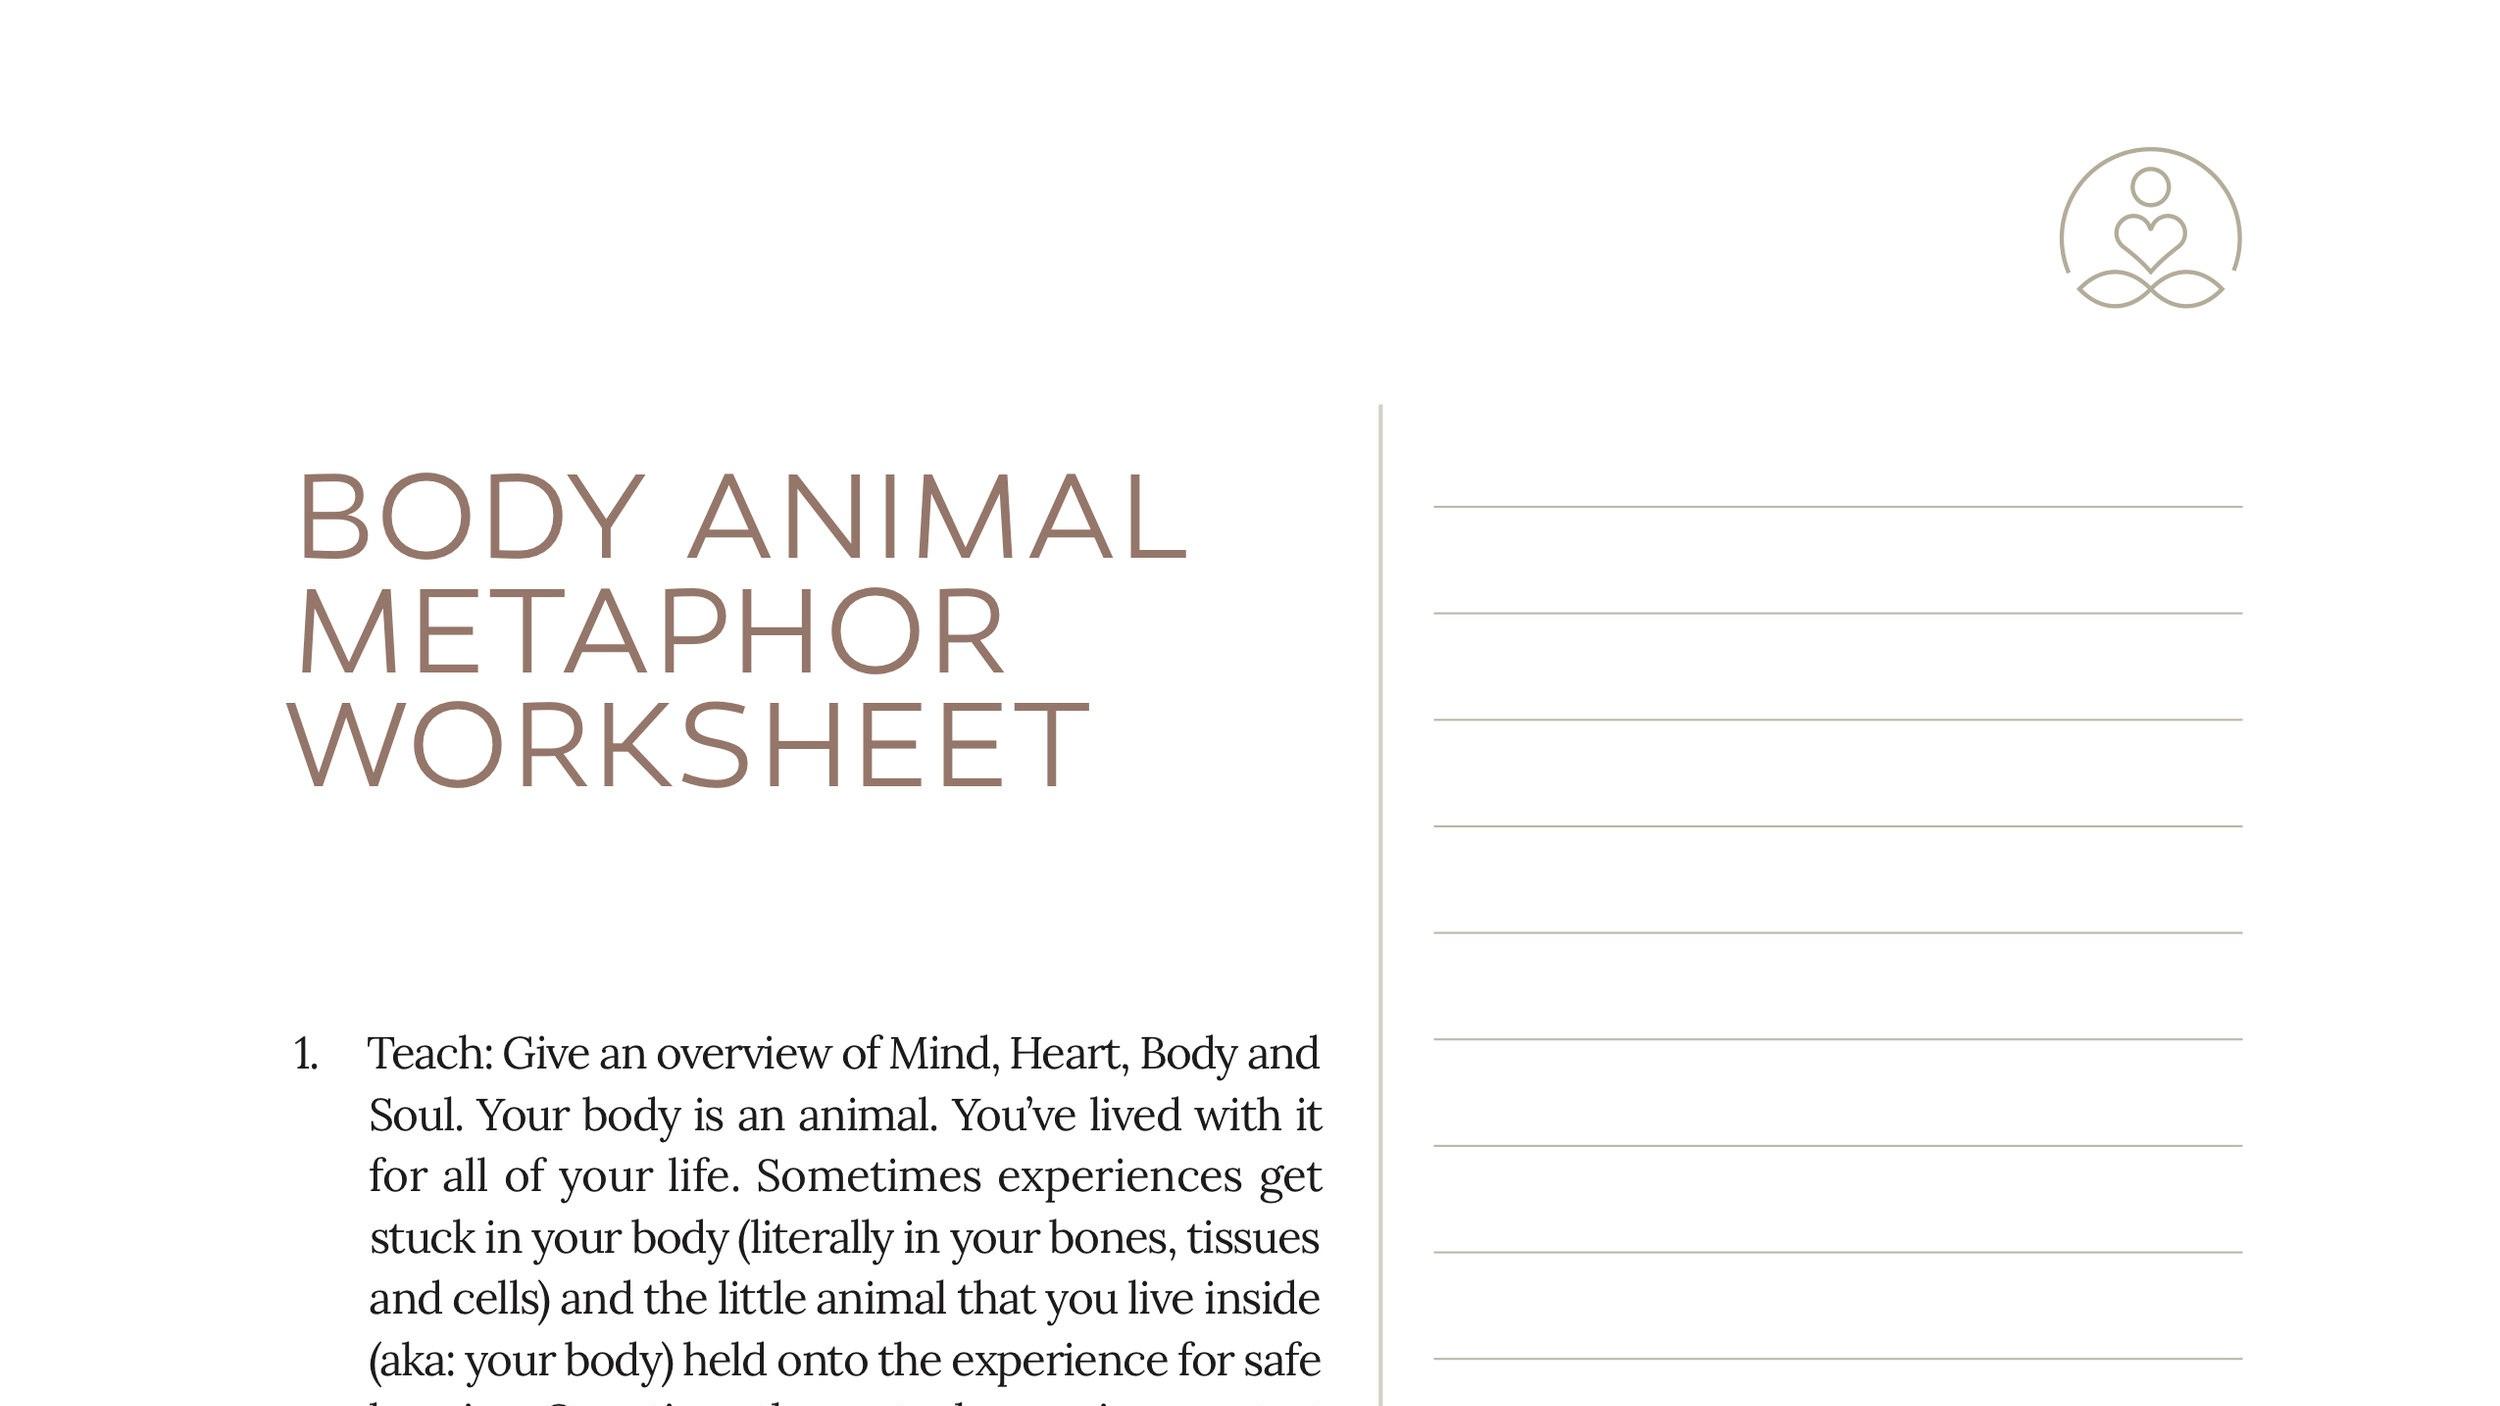 Body Animal Metaphor Worksheet.jpg